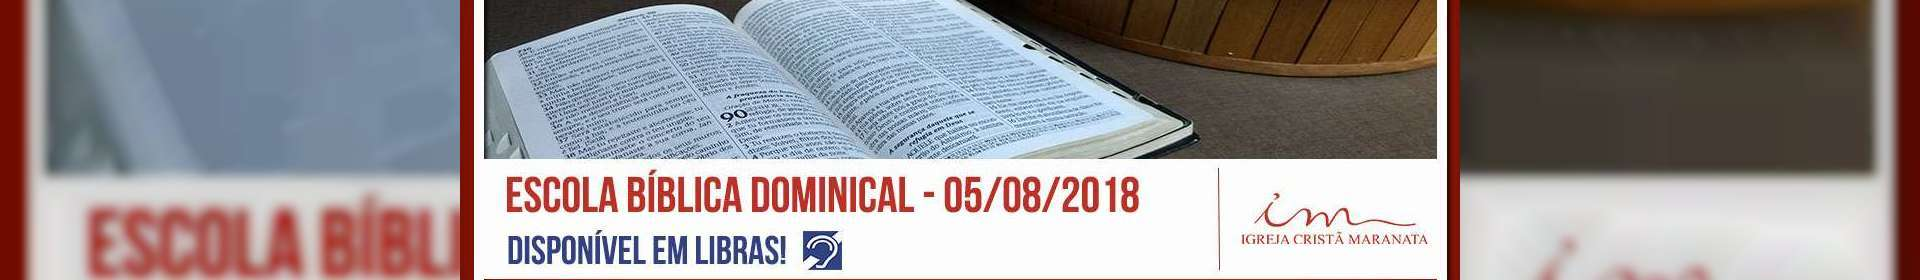 EBD 05/08/2018 - Transmissão Opcional